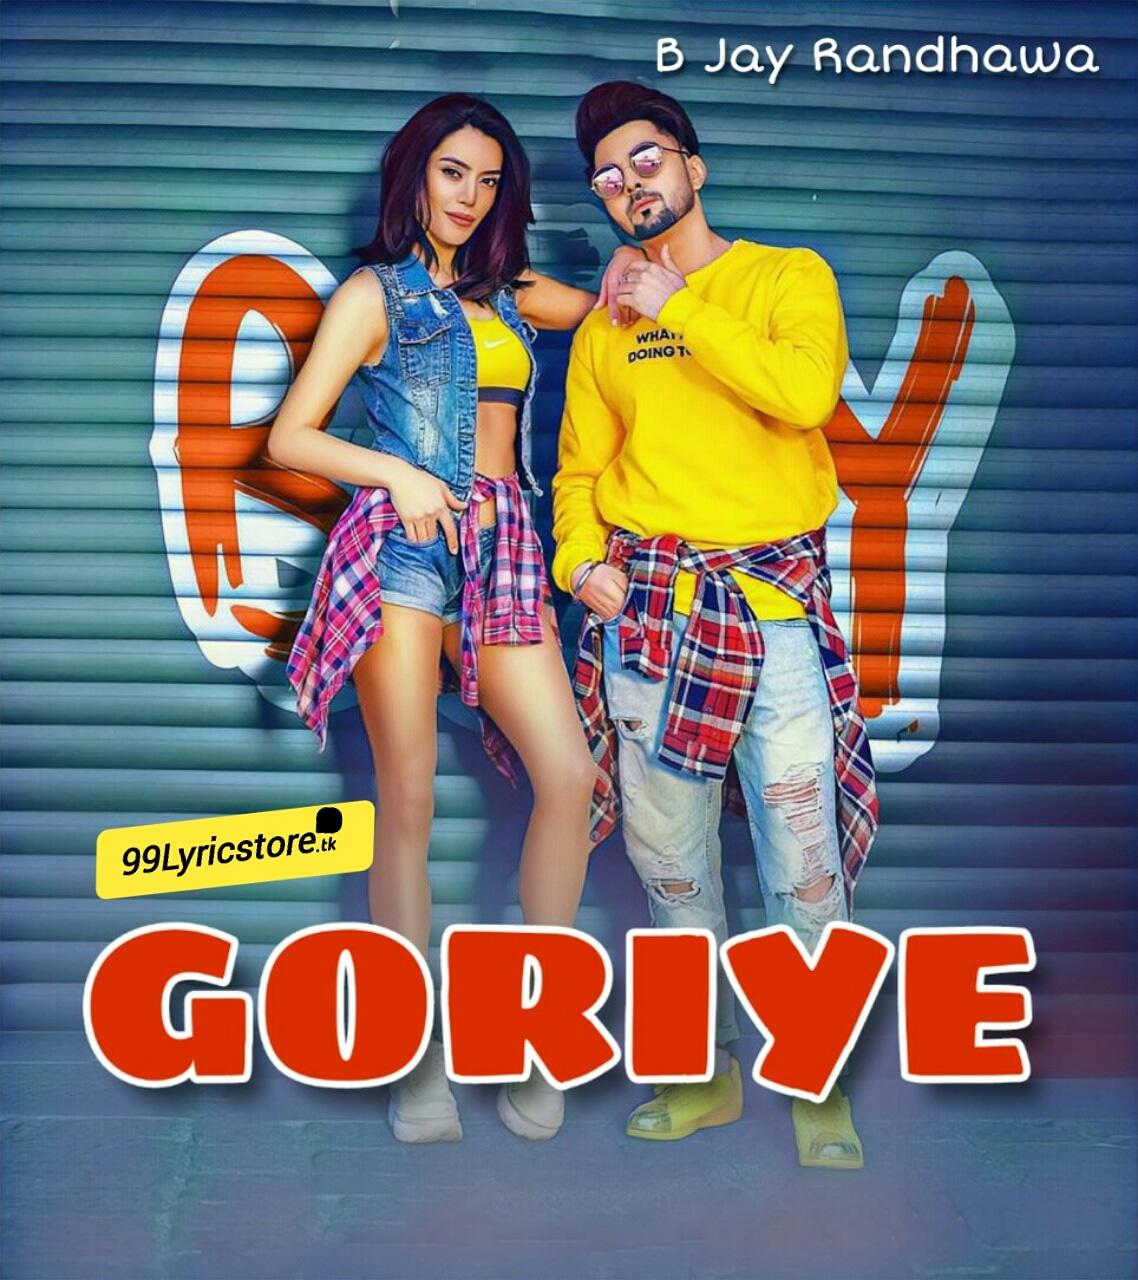 GORIYE Punjabi Song Lyrics Sung by B Jay Randhawa and directed by satti dhillon